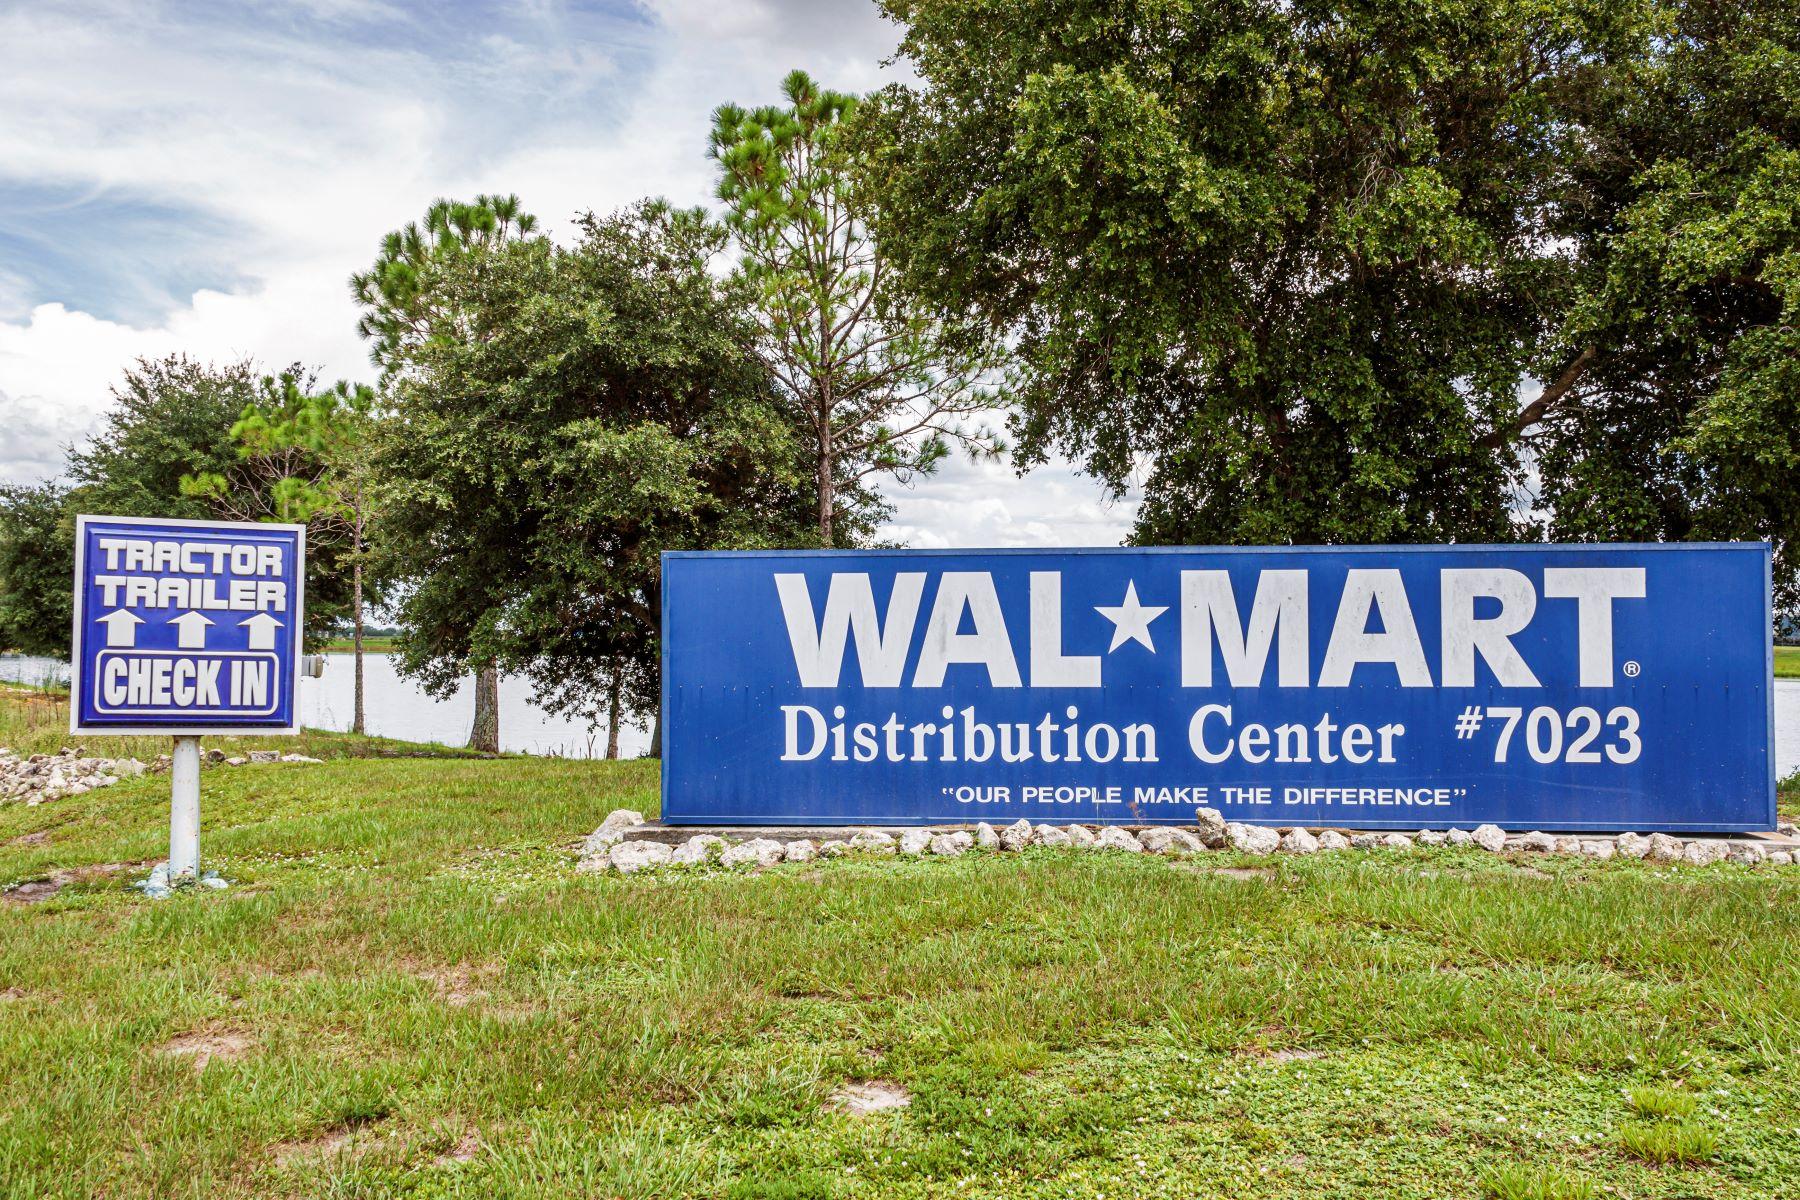 A Walmart distribution center in Arcadia, Florida